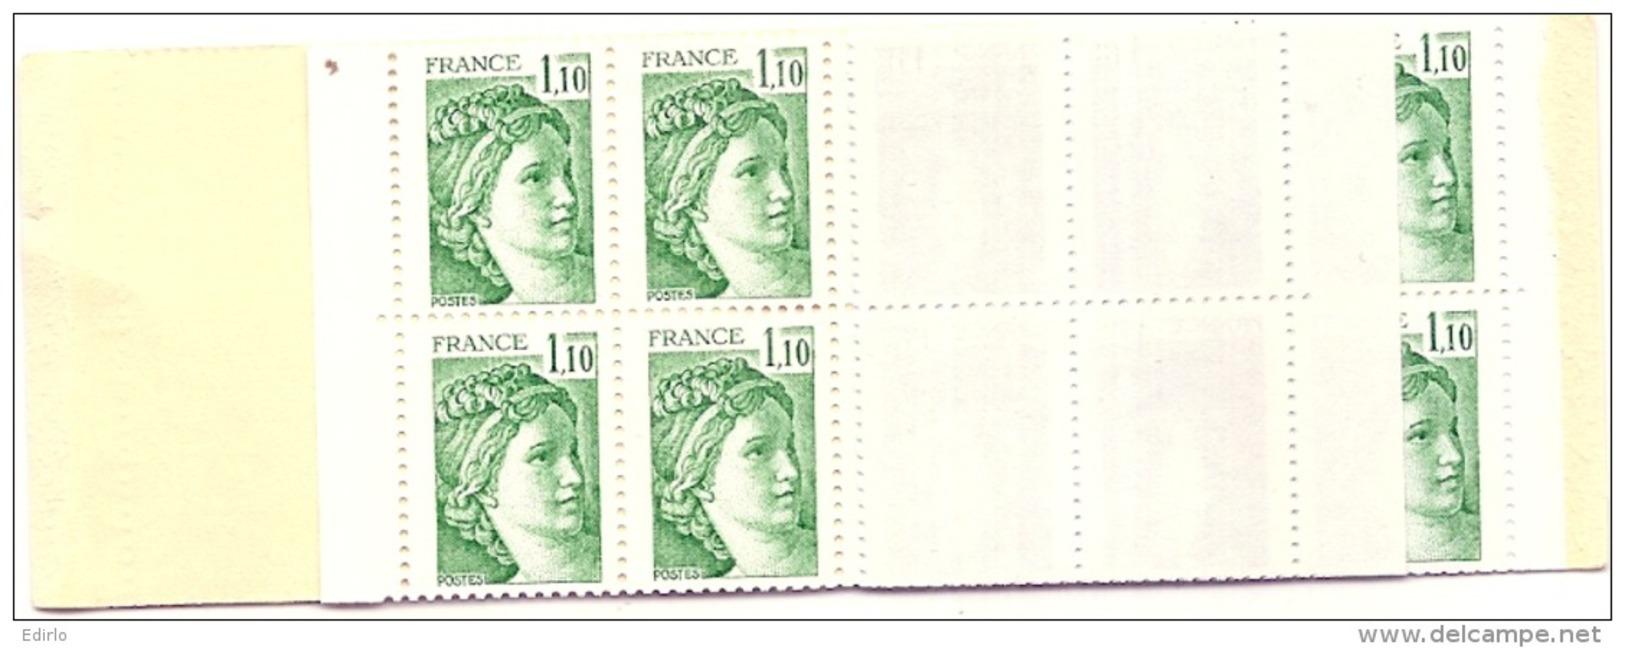 Carnet Usage Courant De 20 Sabine De Gandon 2058C1  Gomme Brillante Code Postal (381) Côte 23&euro Impression Verte - Carnets